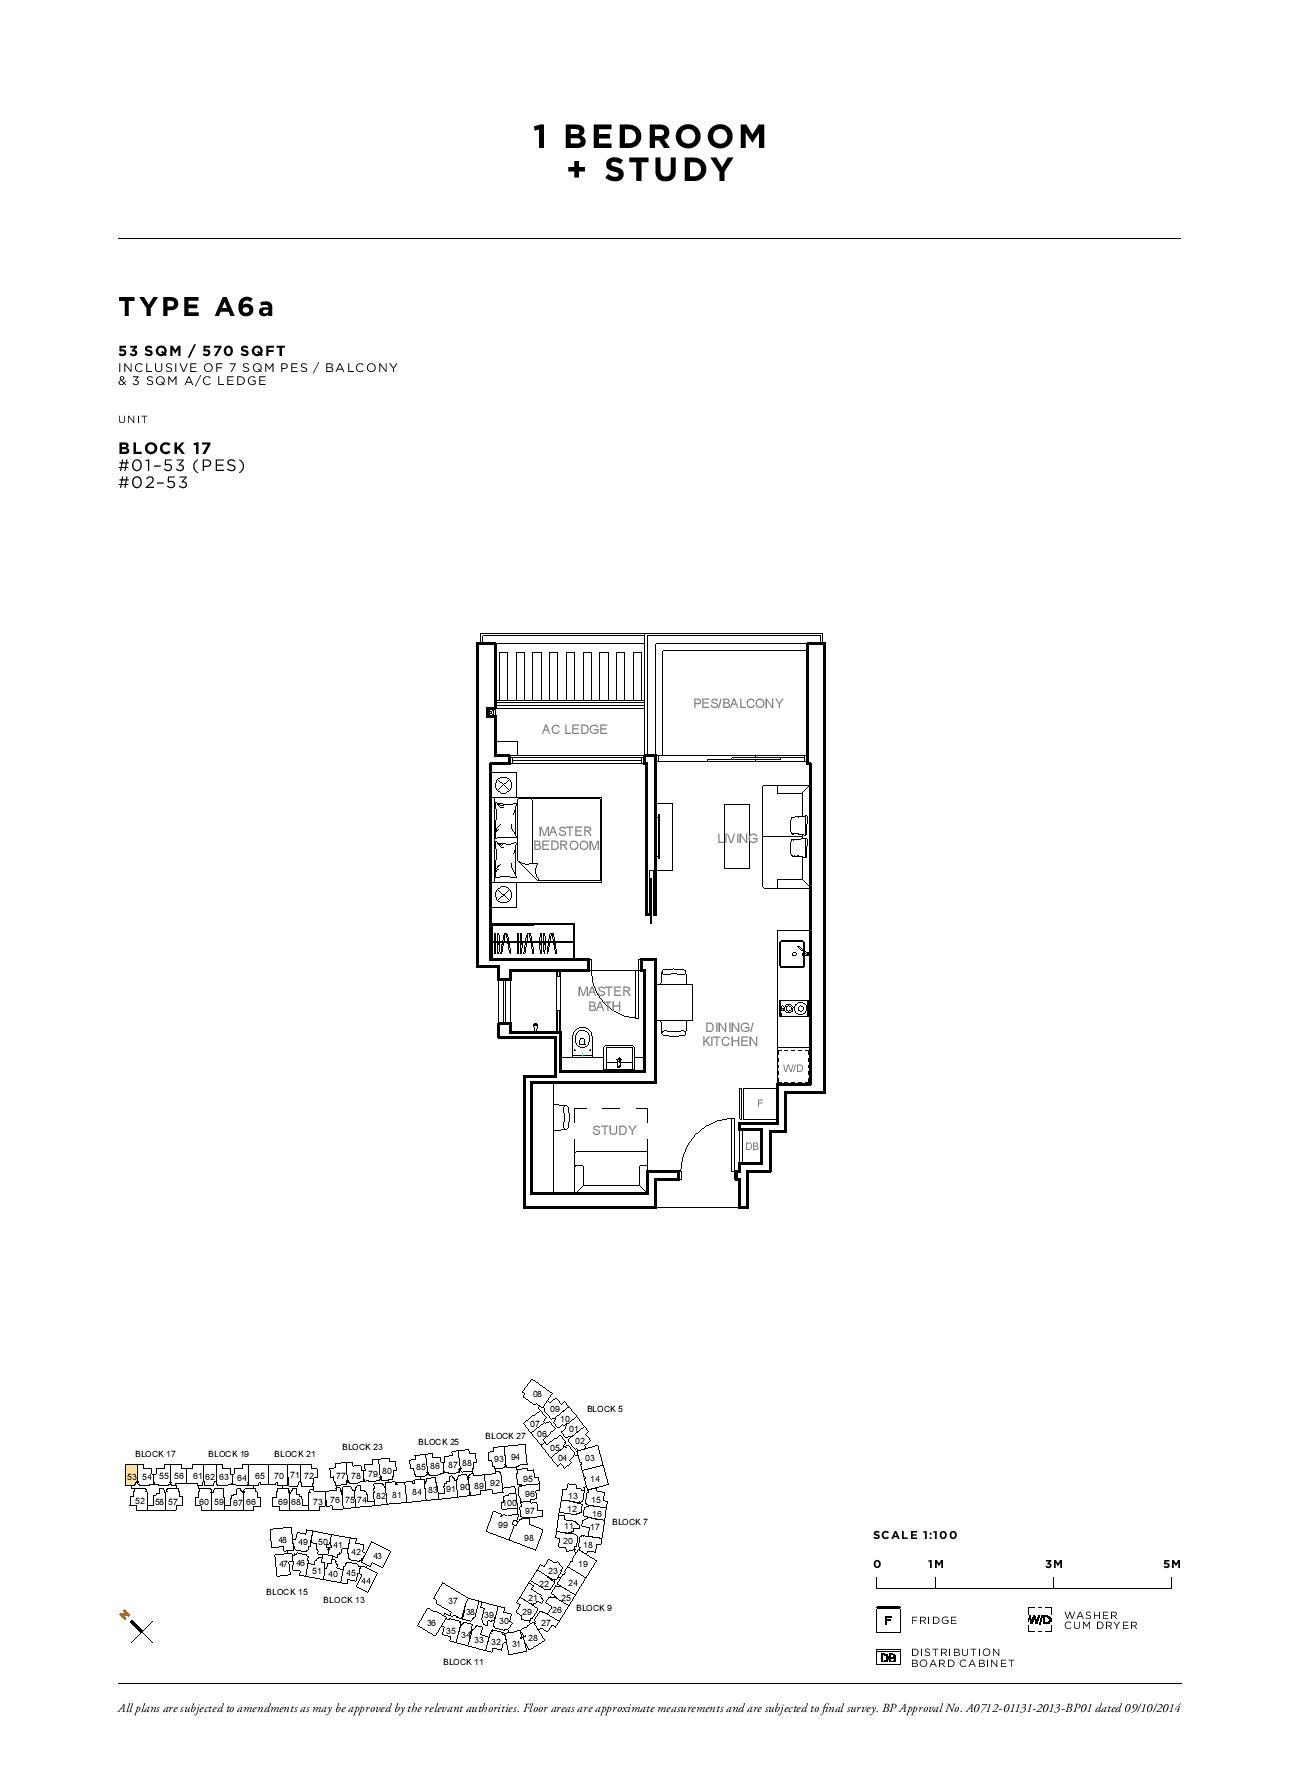 Sophia Hills 1 Bedroom + Study Type A6a Floor Plans